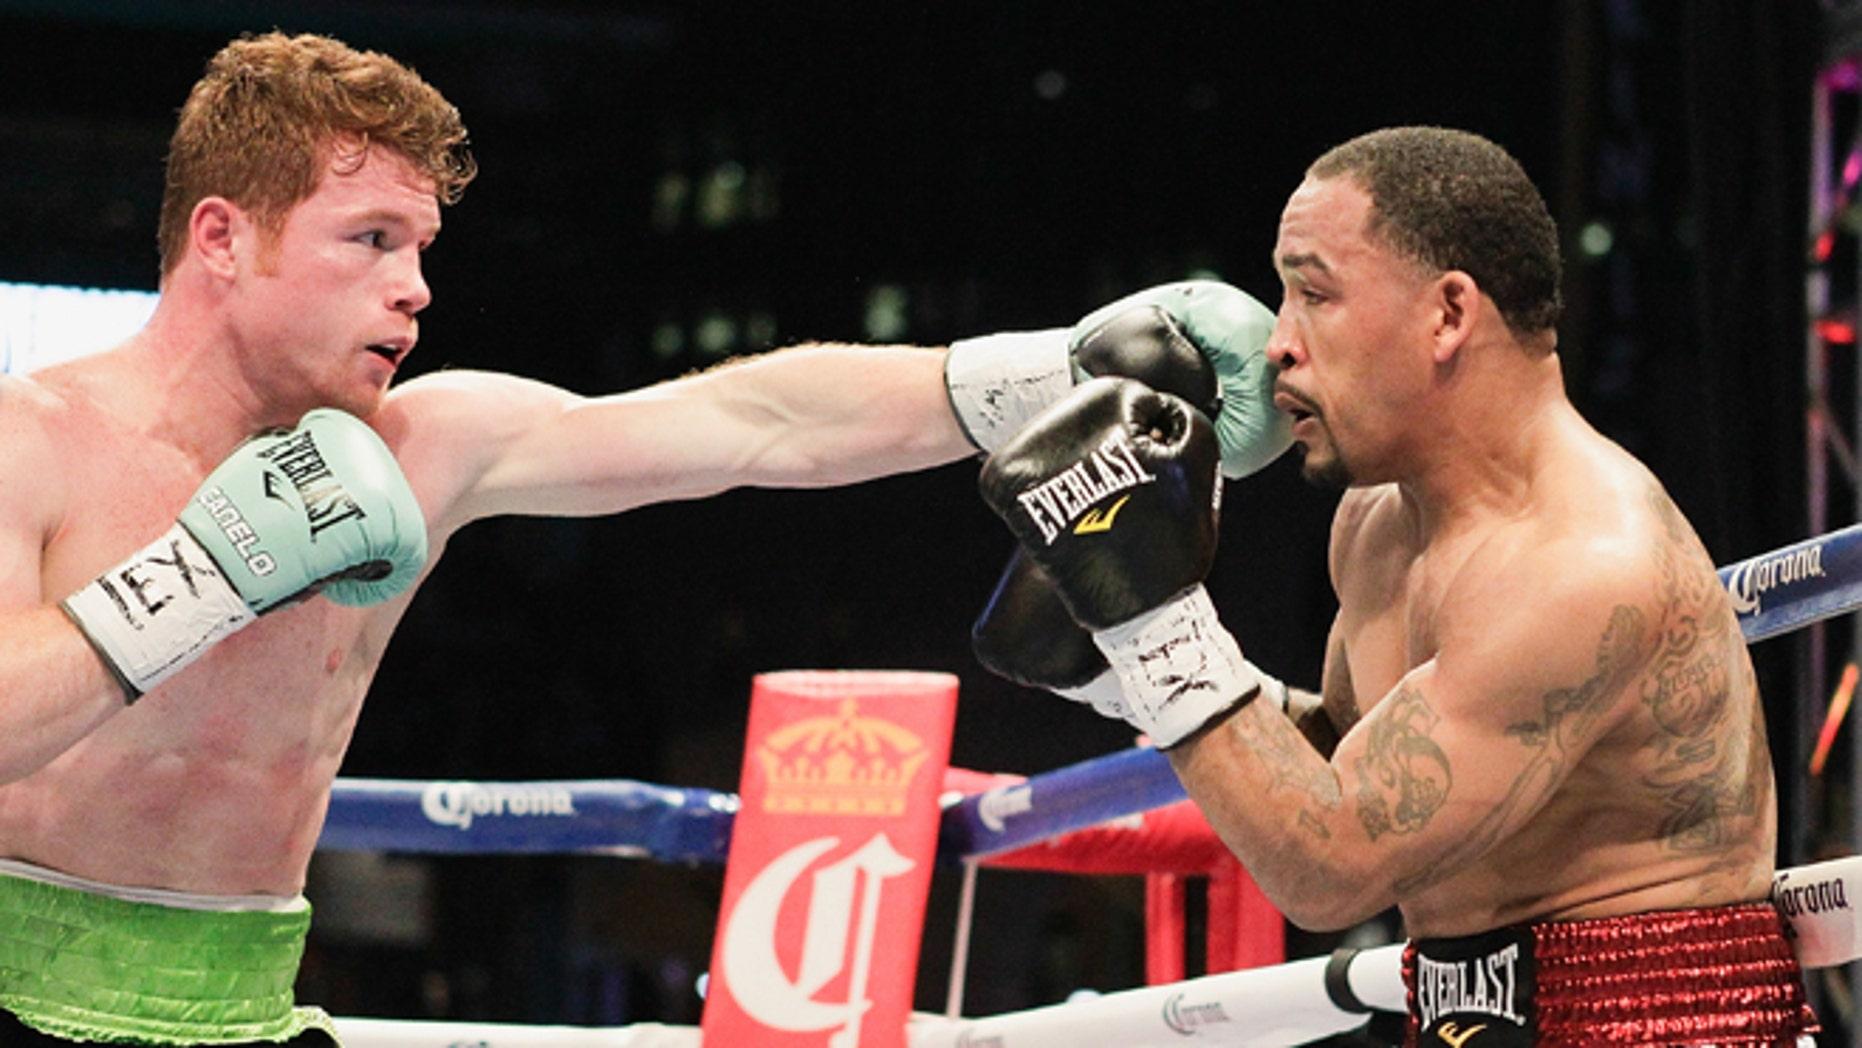 "Saul ""Canelo"" Alvarez, left, lands a a jab to the face of James Kirkland during a 154-pound fight on Saturday, May 9, 2015, in Houston. Alvarez won the bout. (AP Photo/Bob Levey)"